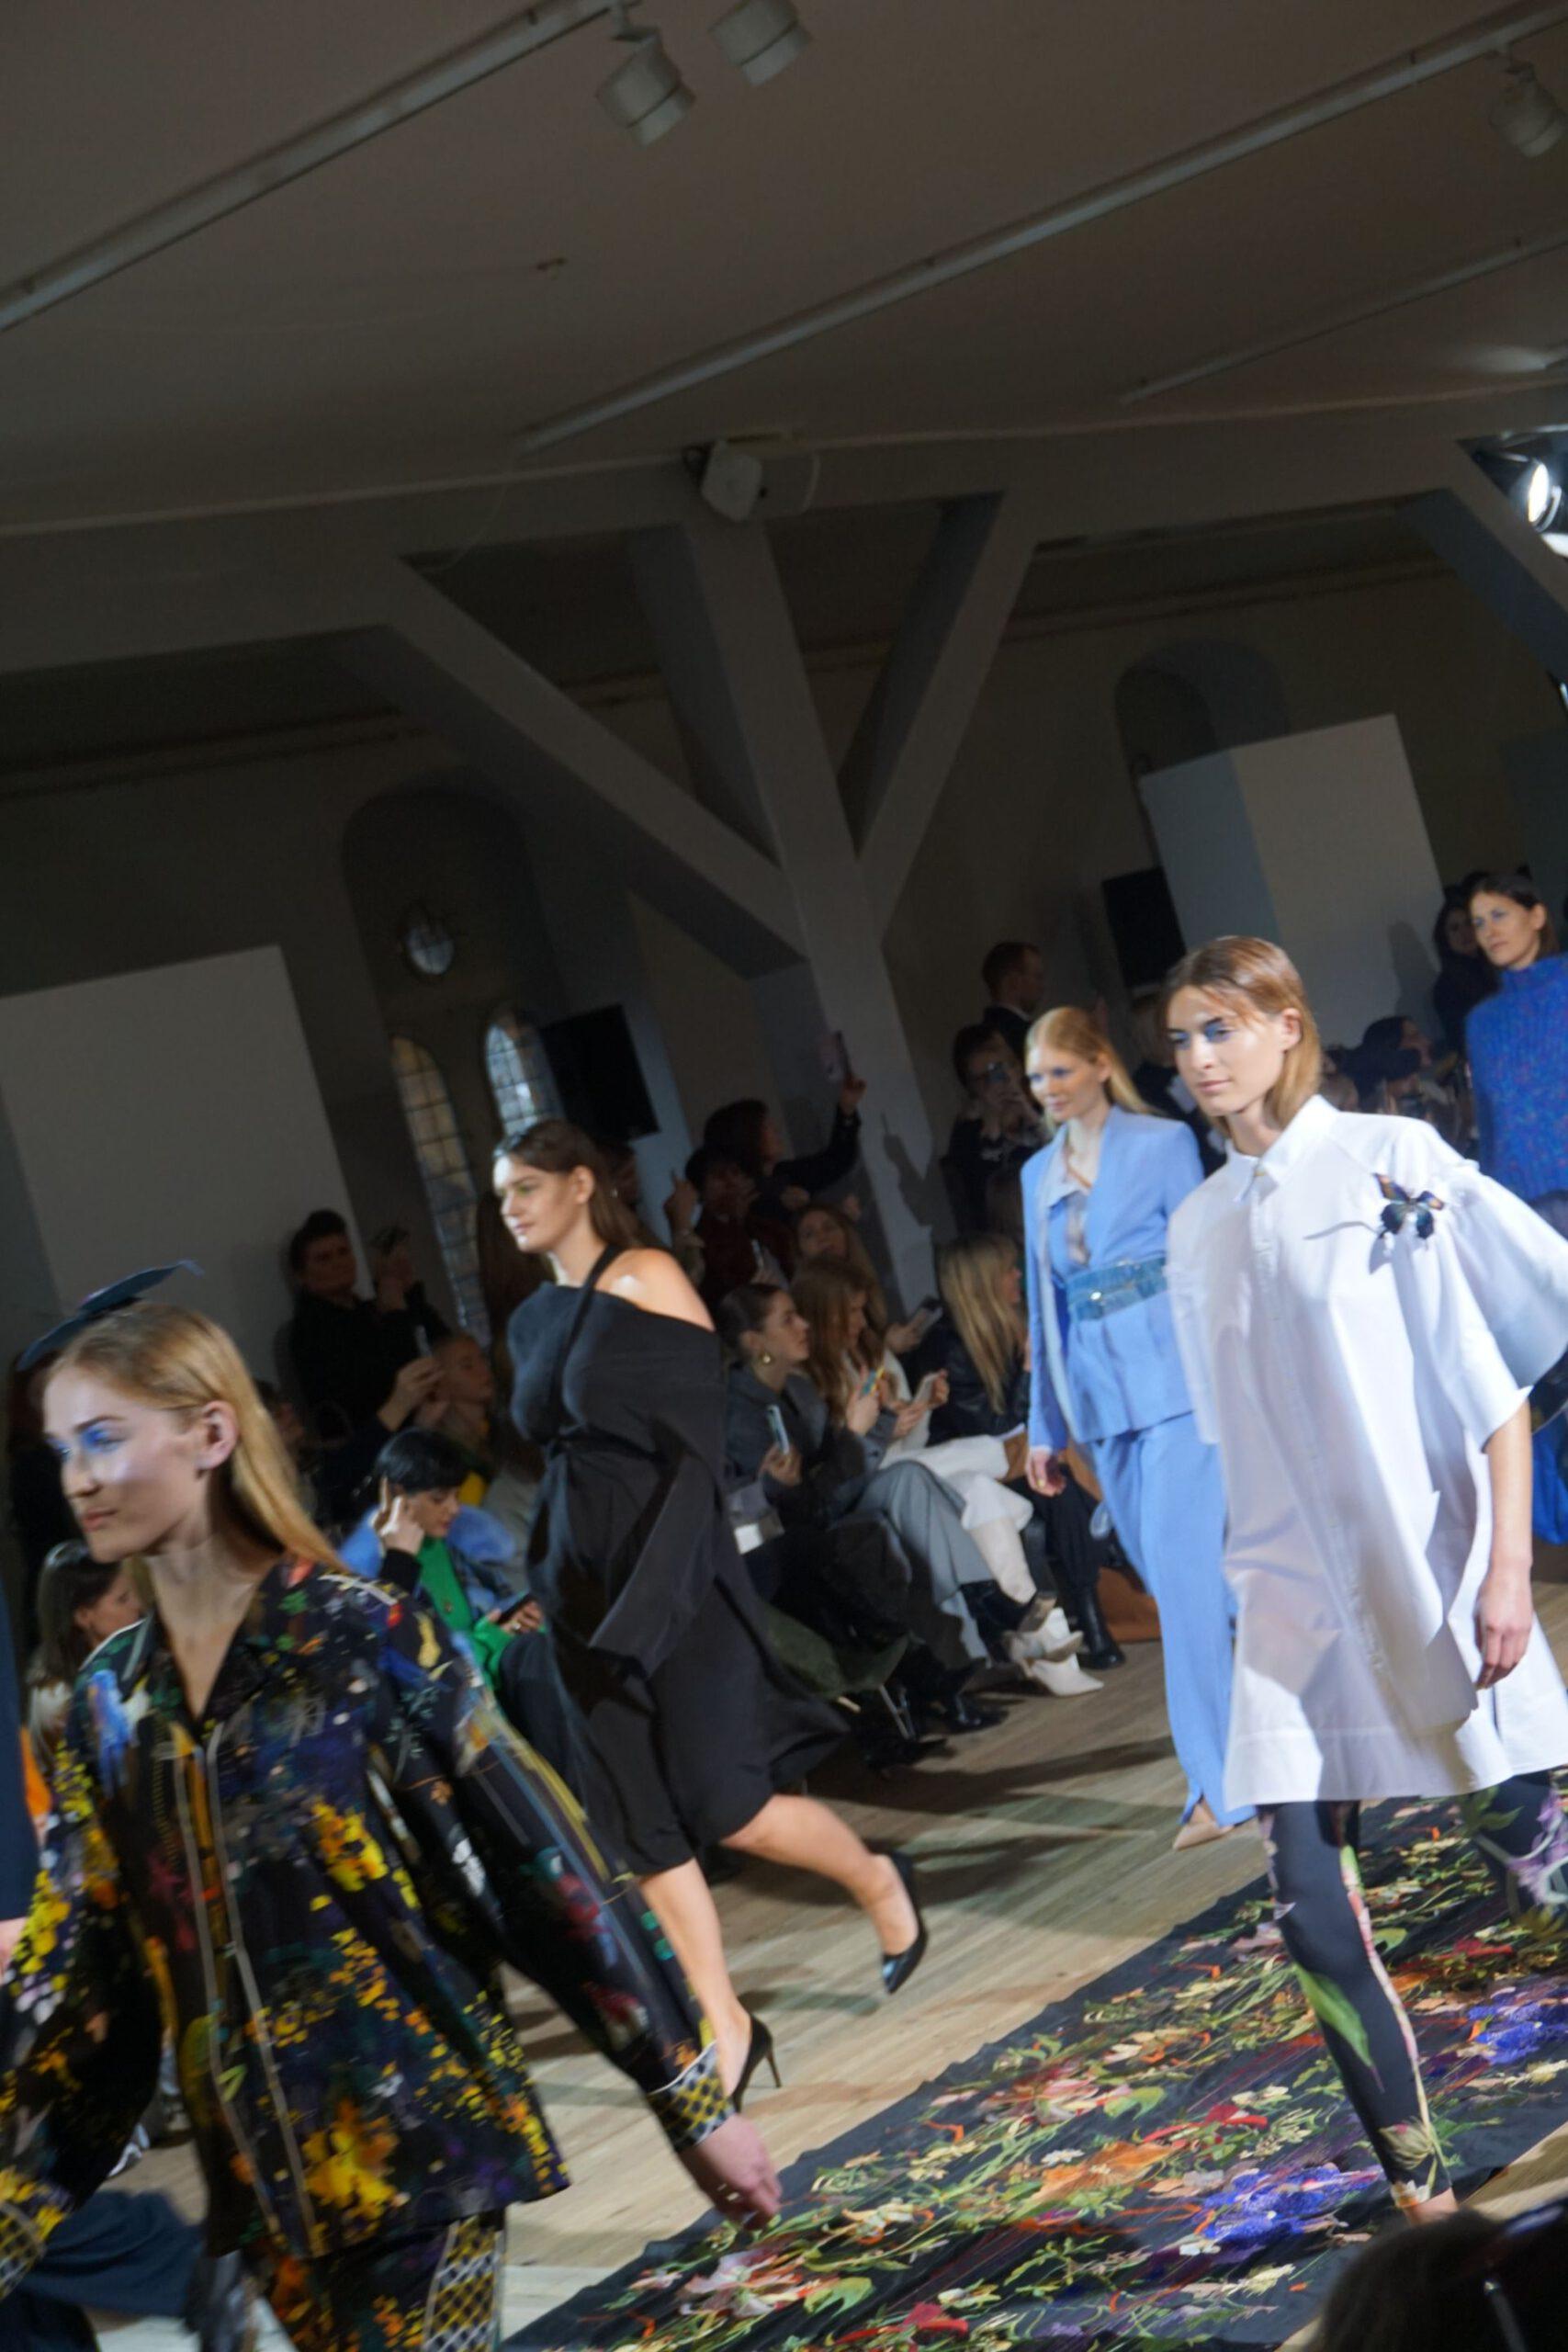 blanche copenhagen fashion show 14